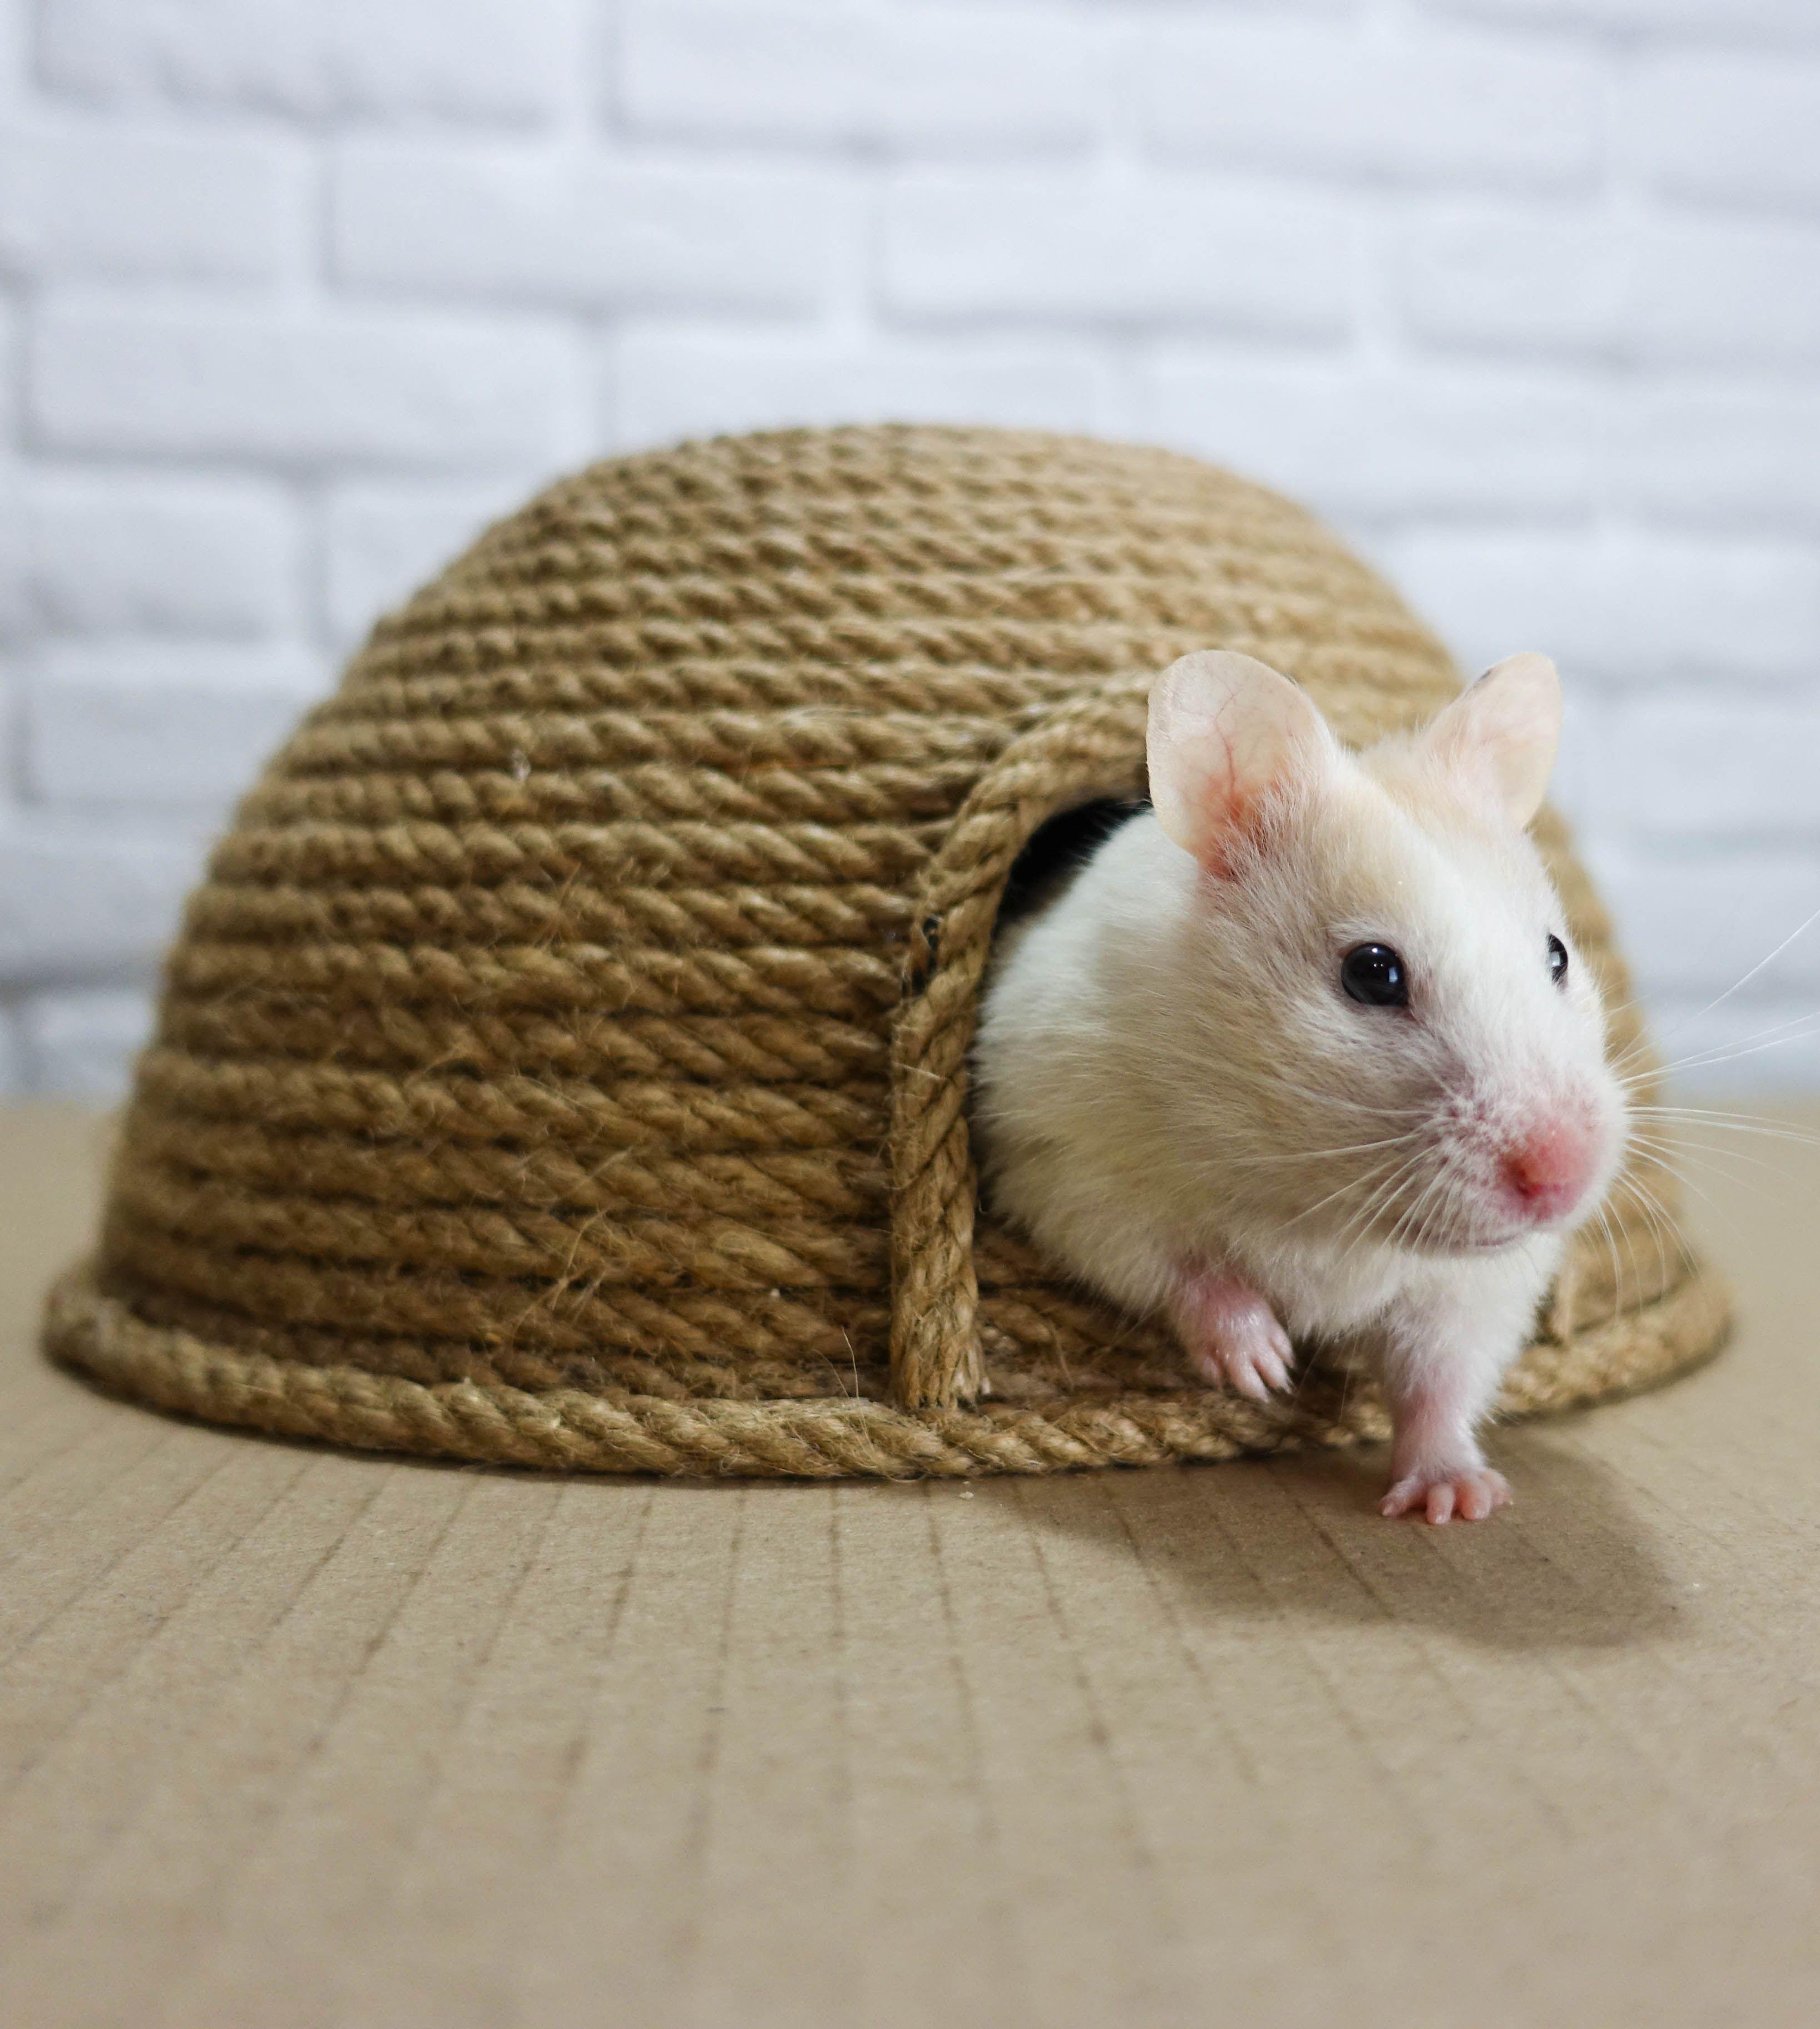 How To Make A Jute Hamster House Hamster Habitat Hamster Bedding Cute Hamsters